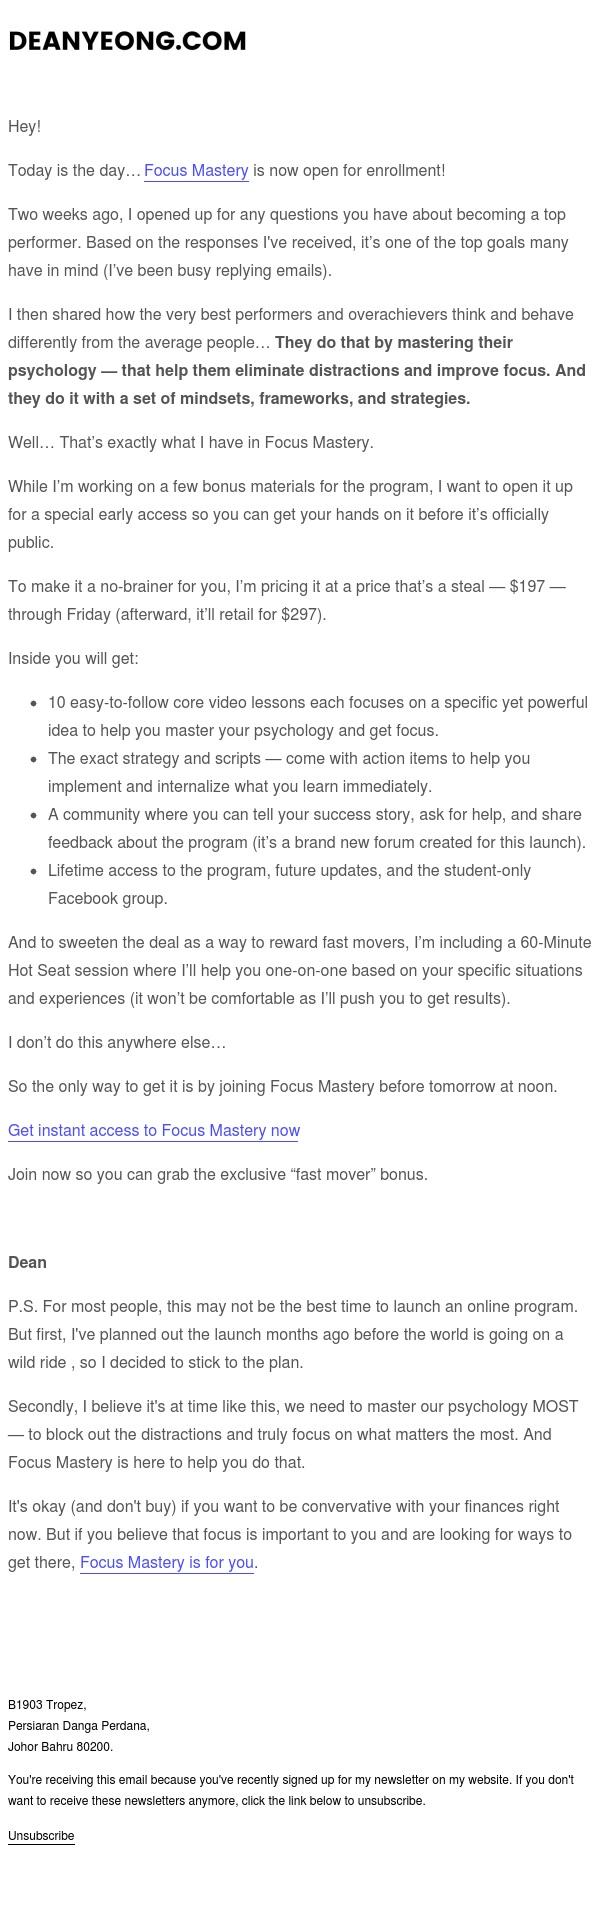 Now available: Focus Mastery (details + bonus inside)